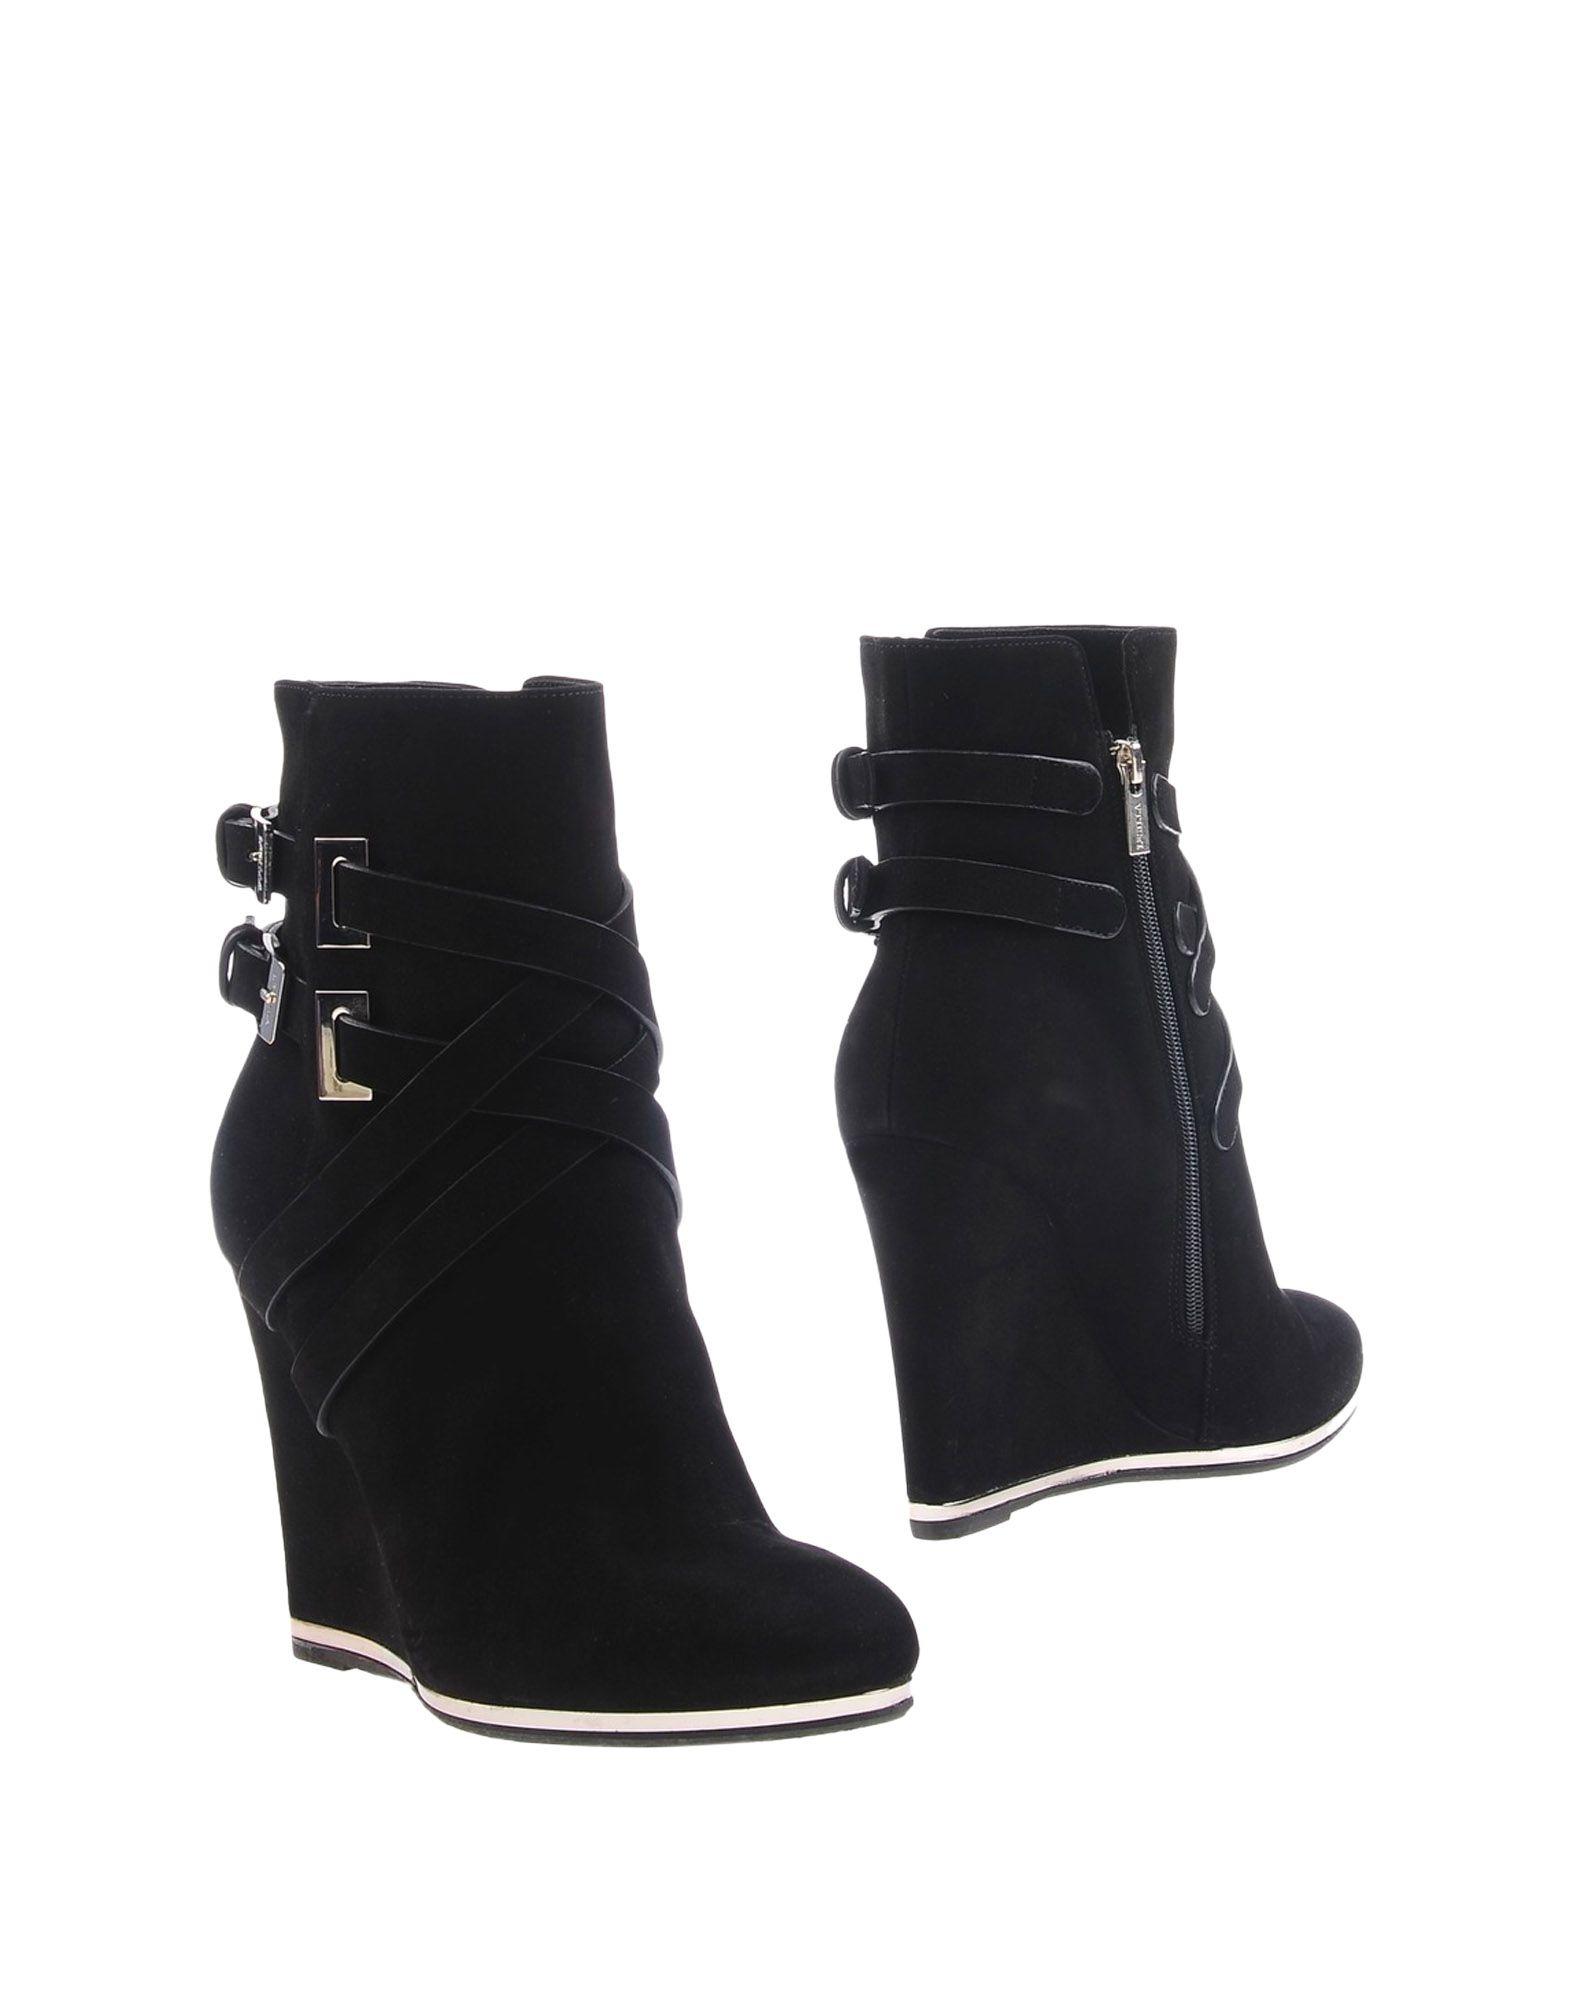 Rabatt Schuhe  Le Silla Stiefelette Damen  Schuhe 11287594GK fb8ea3